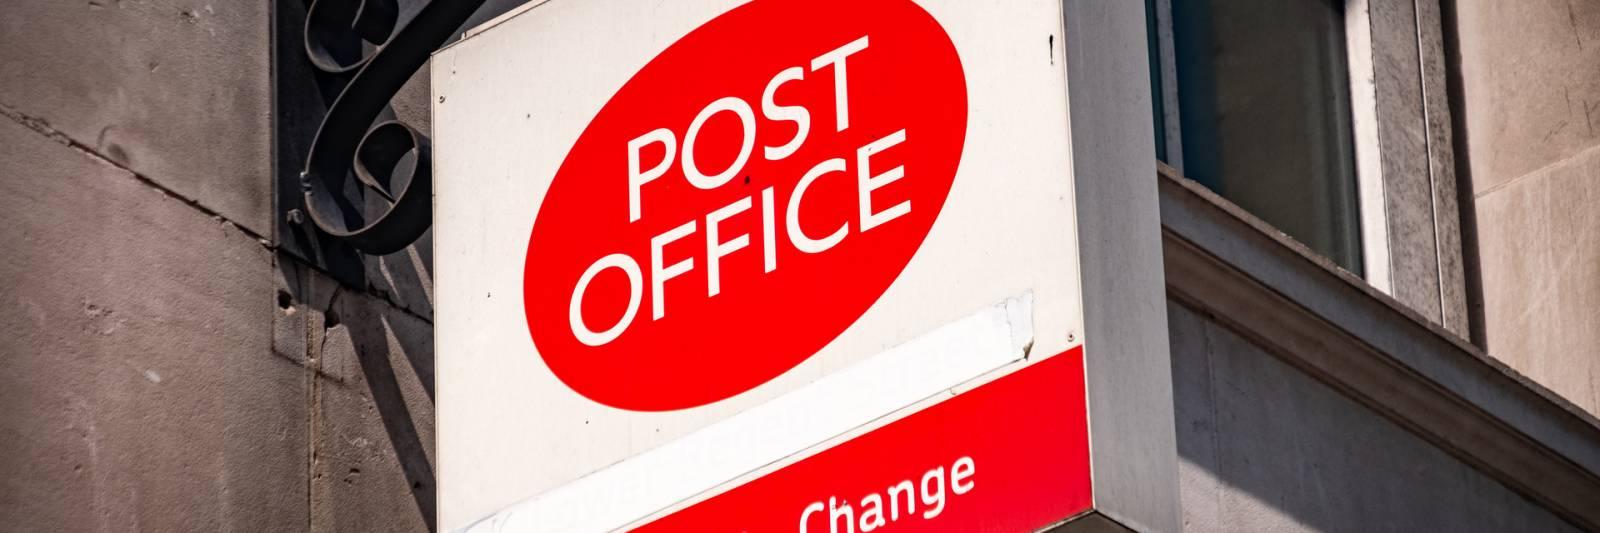 Post Office Embraces Biometrics For New Digital Identity App